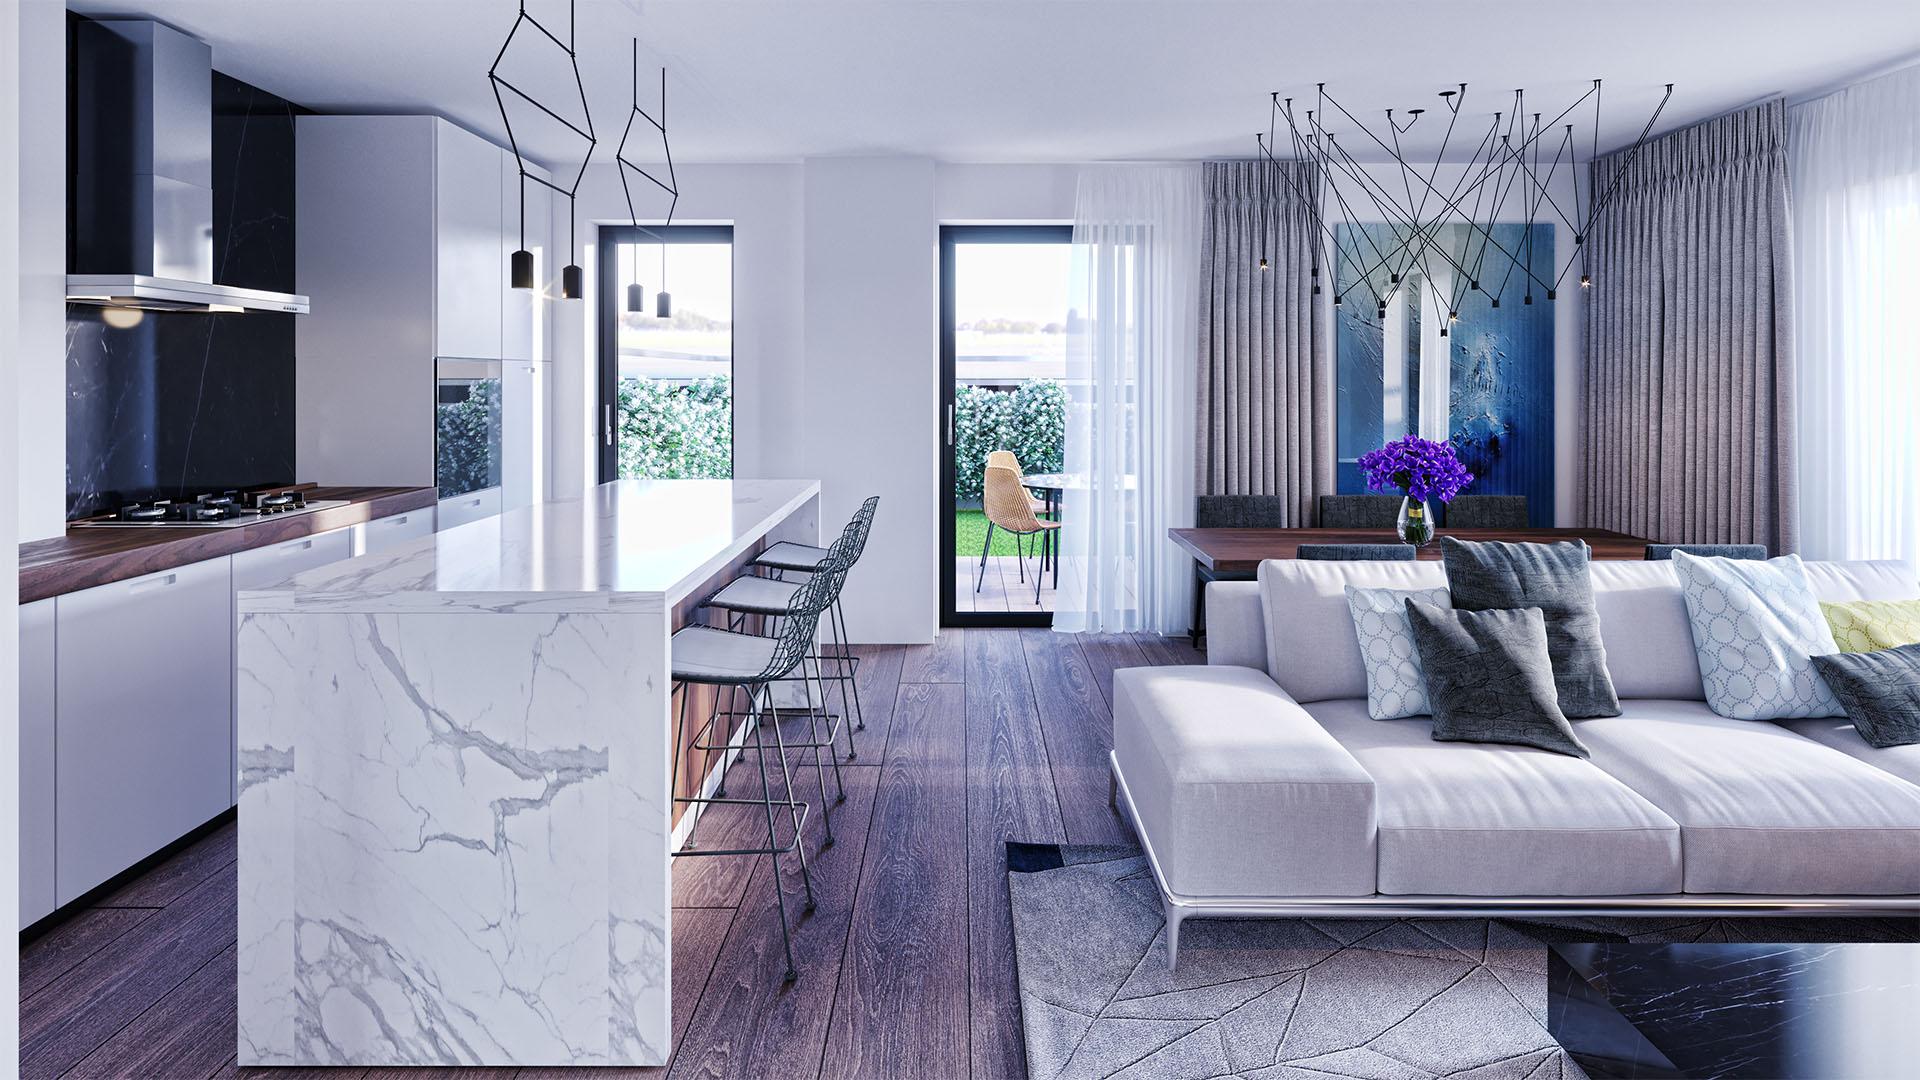 Sunset Lake Homes - propunere amenajare apartament 8